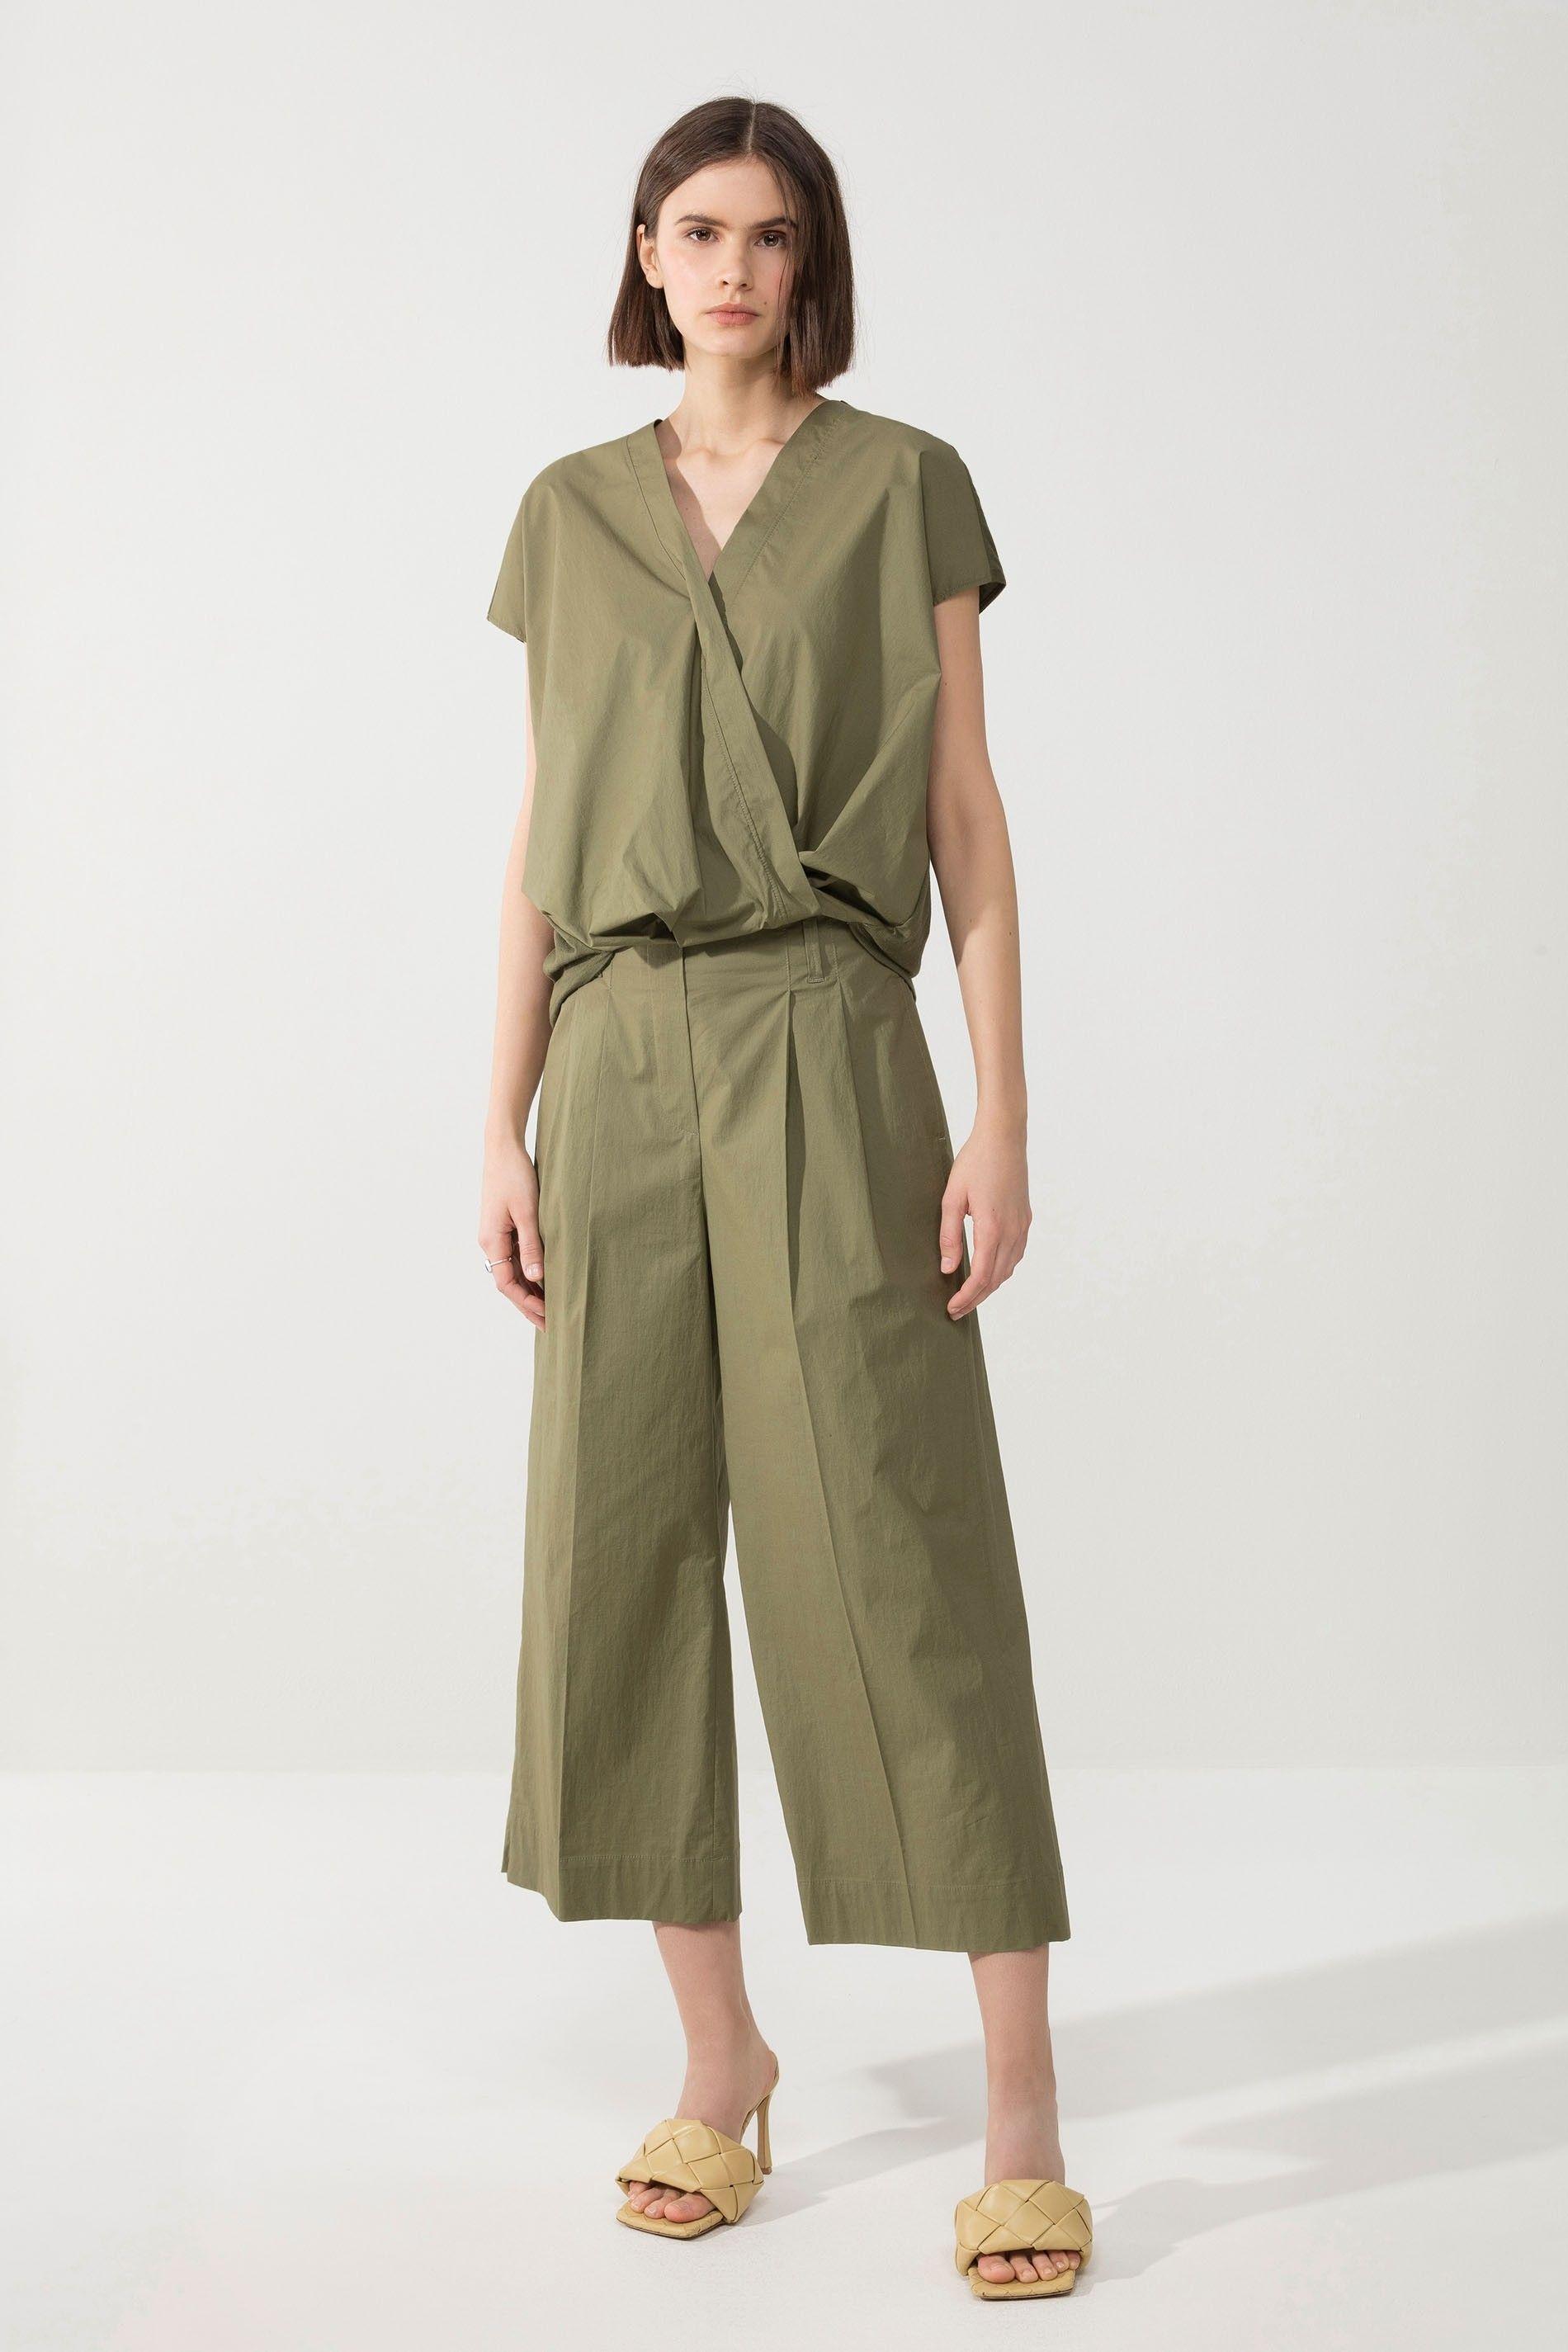 LUISA CERANO - Damen Baumwoll Shirt - Wickeloptik - Olive